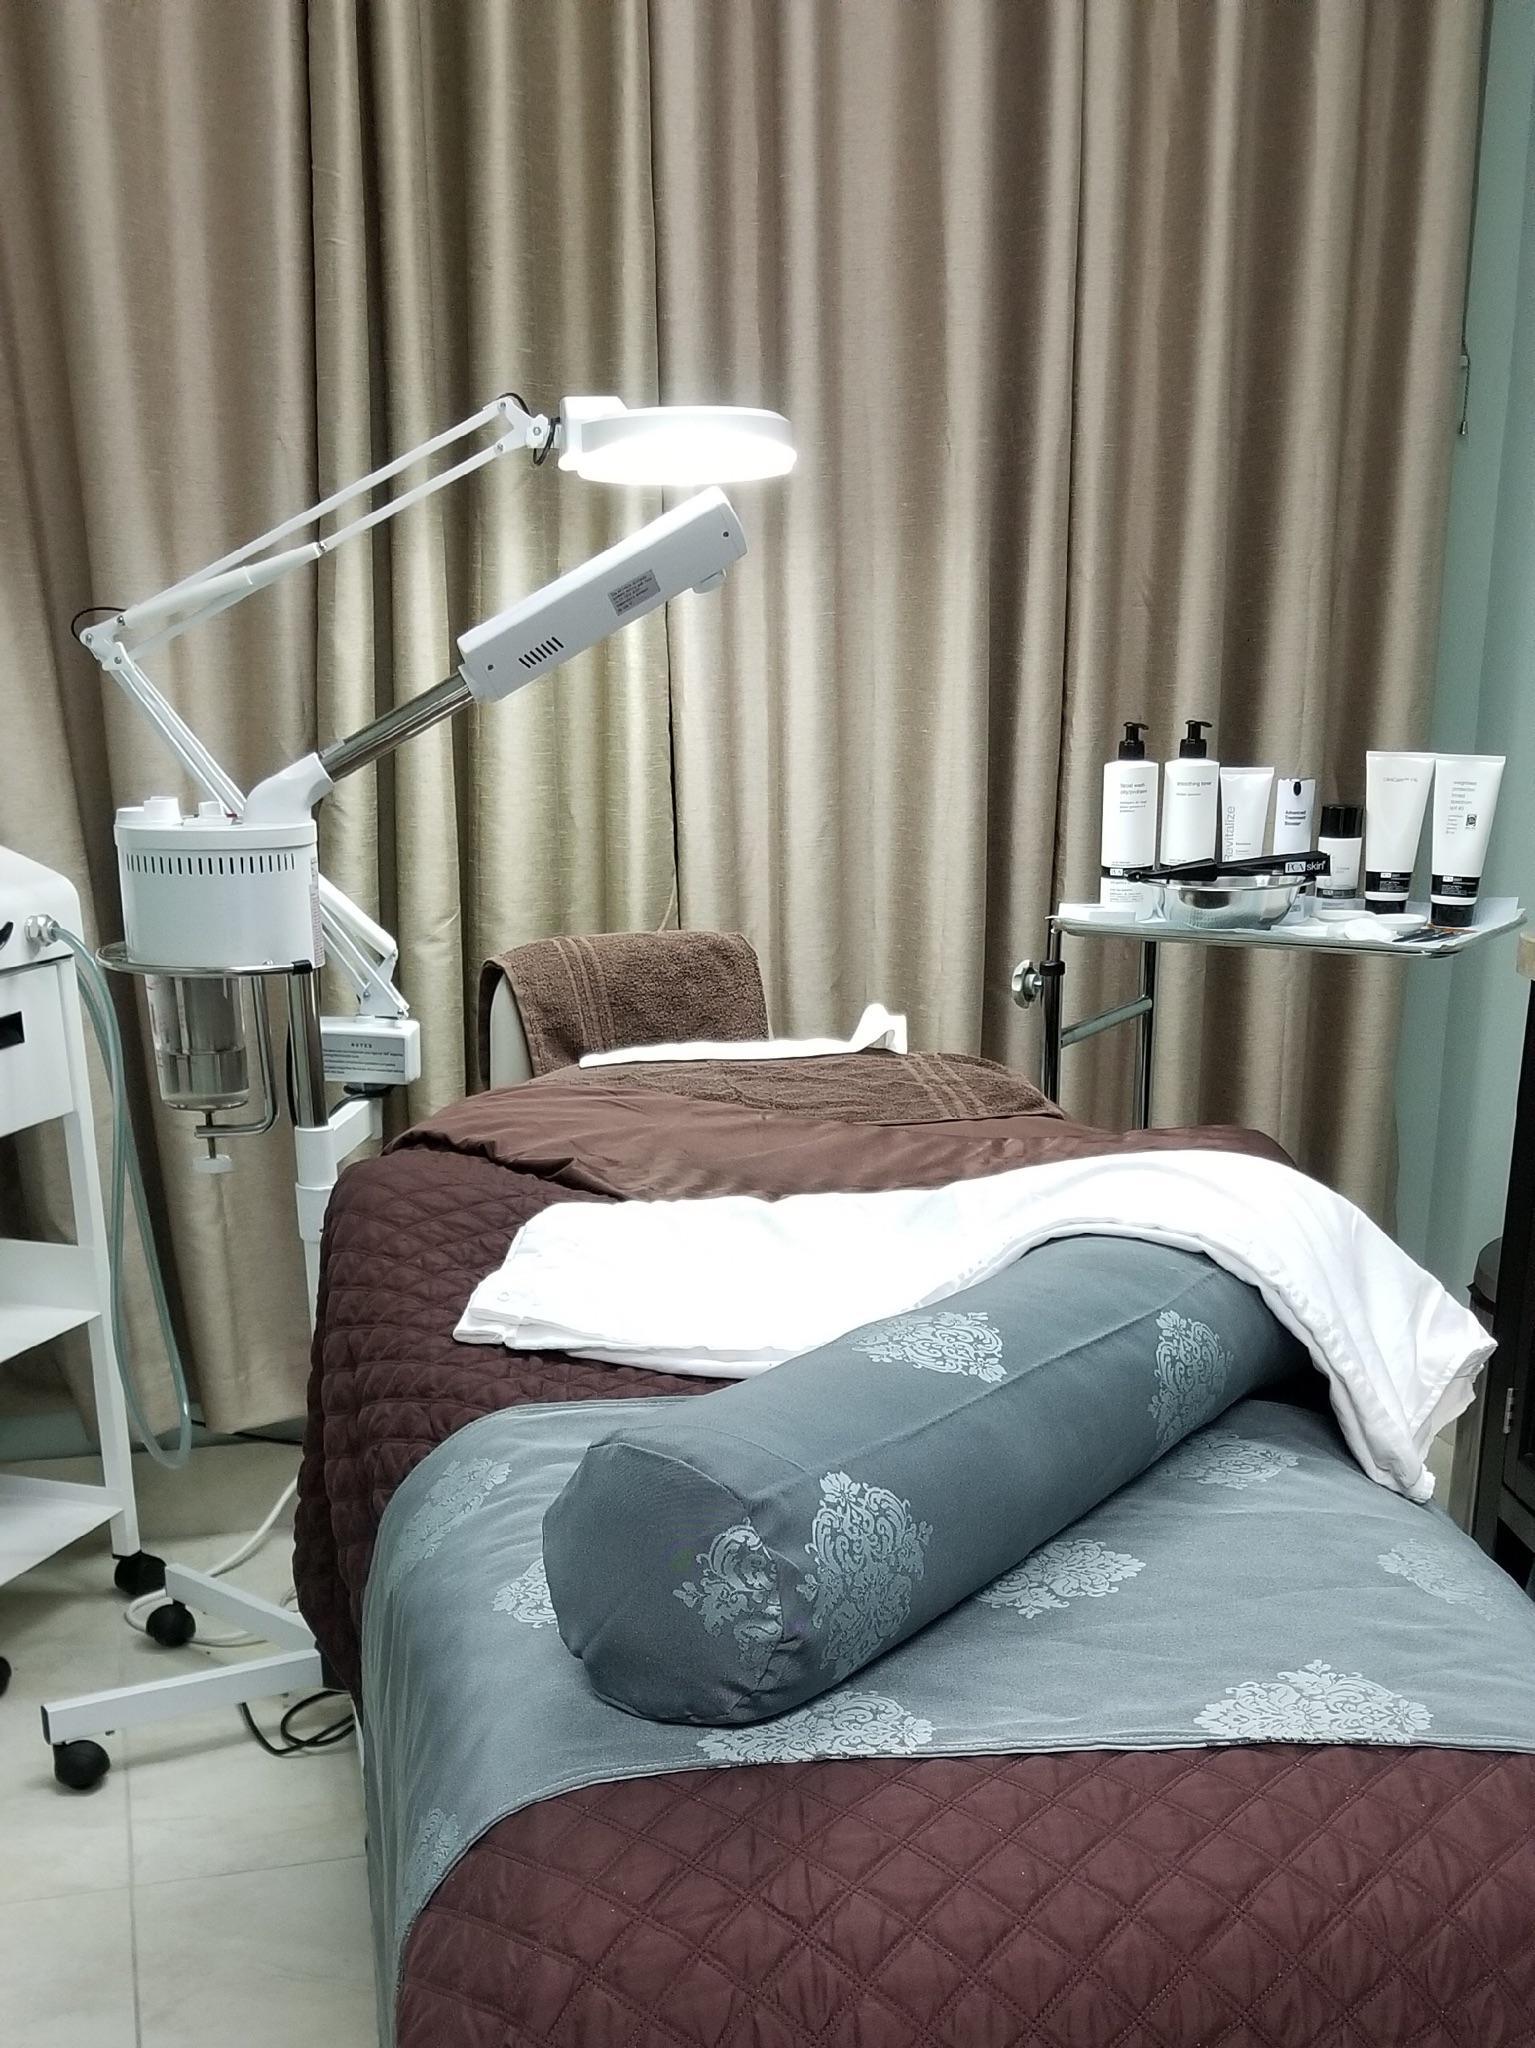 Advantage Dermatology image 1